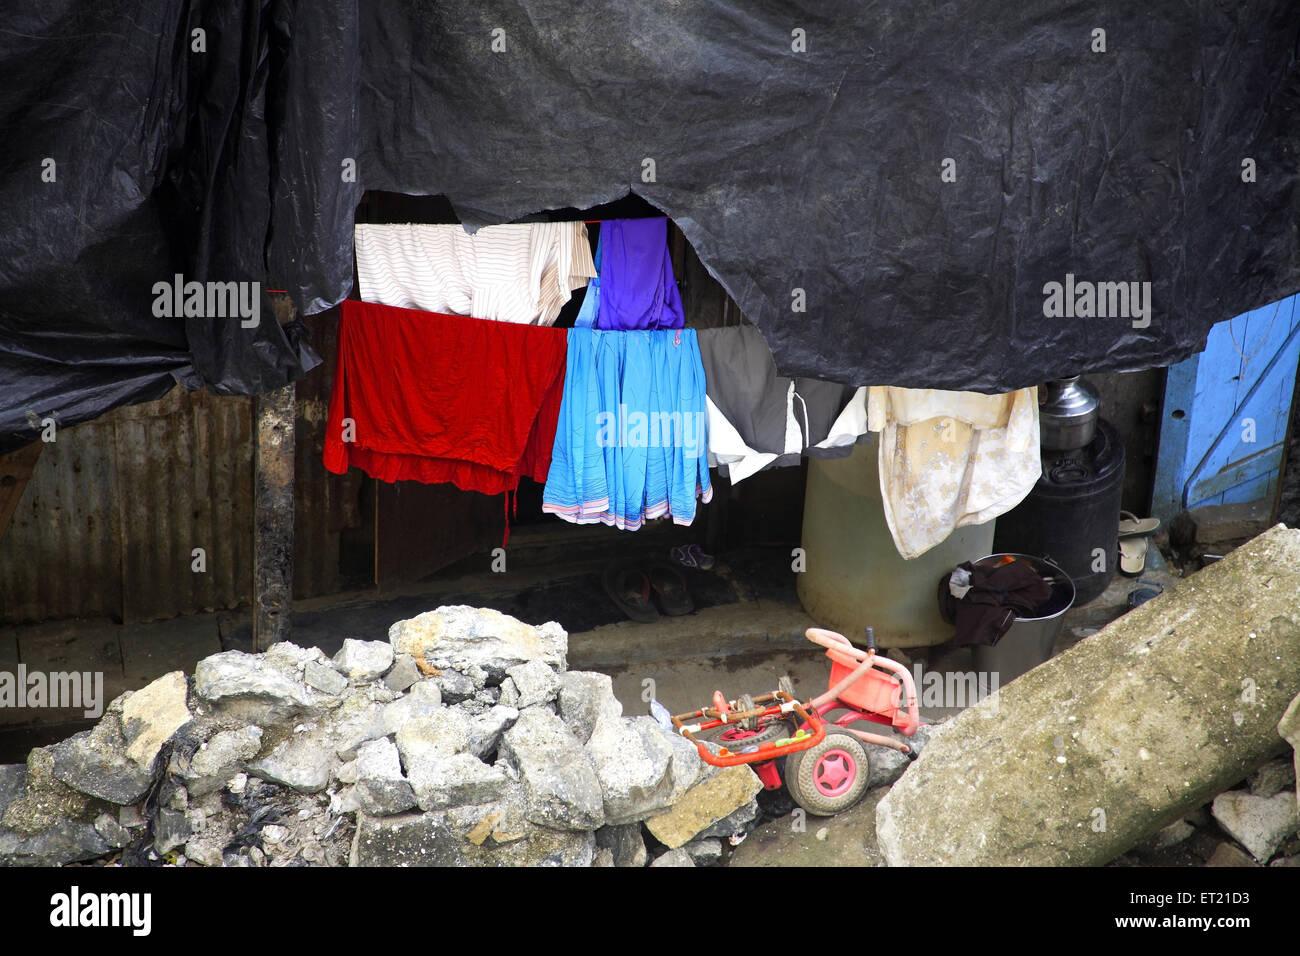 Lámina de plástico y restos de tela de secado en tugurios ; Behram Naupada ; Anant Kanekar Marg ; Bandra Imagen De Stock